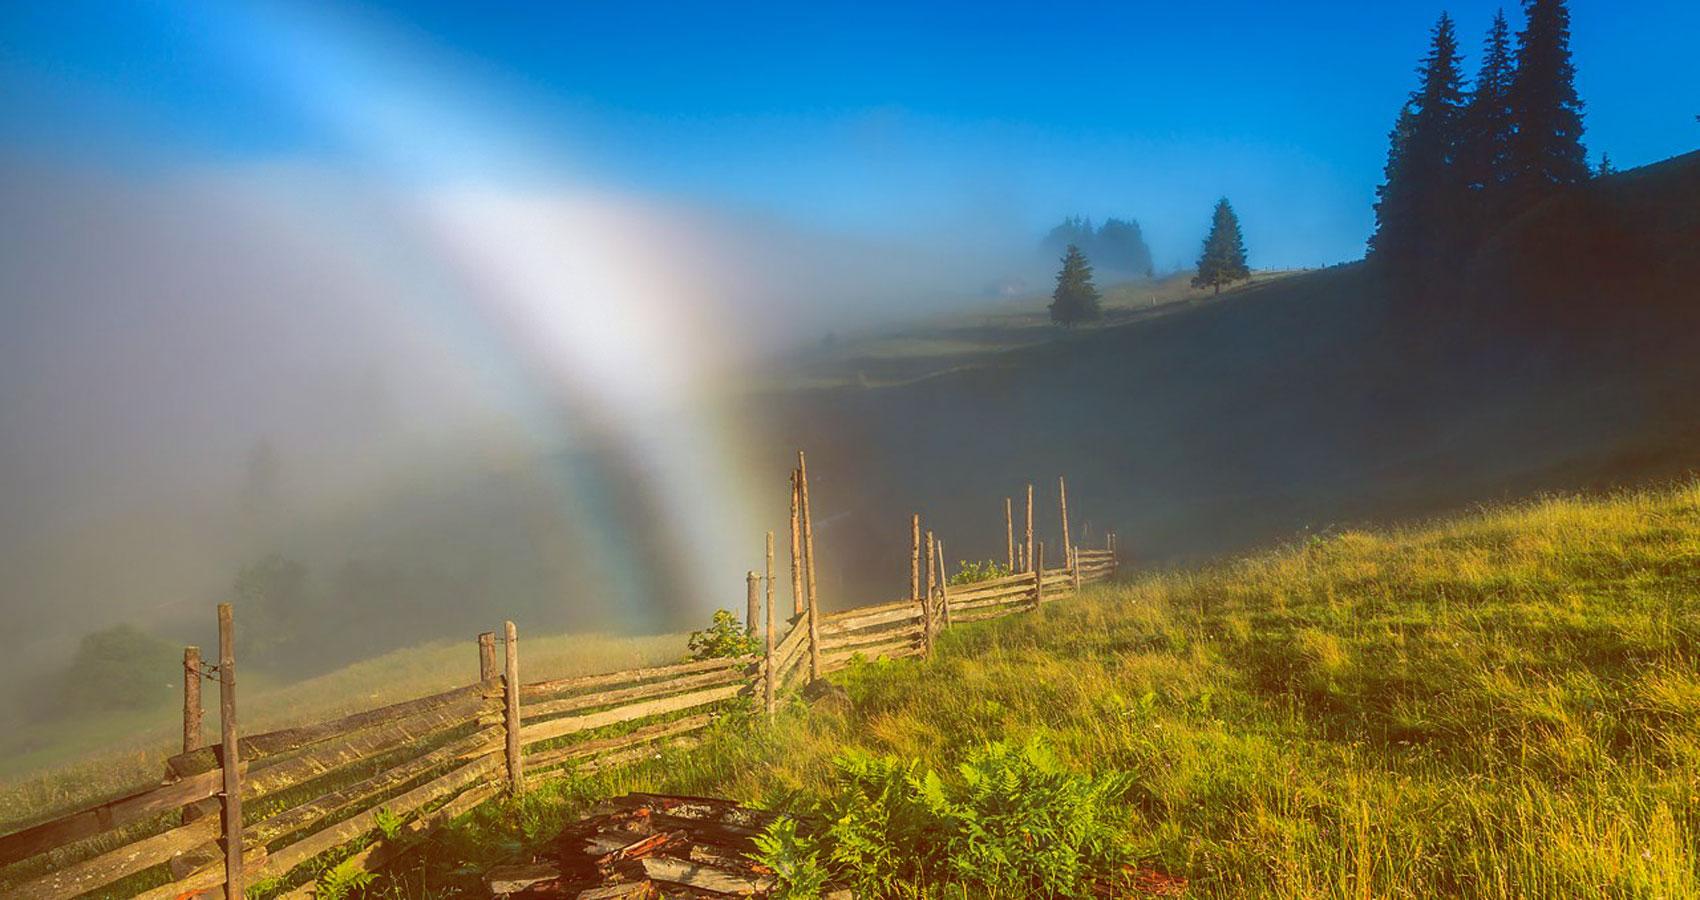 White Rainbow written by Jecht Fair at Spillwords.com